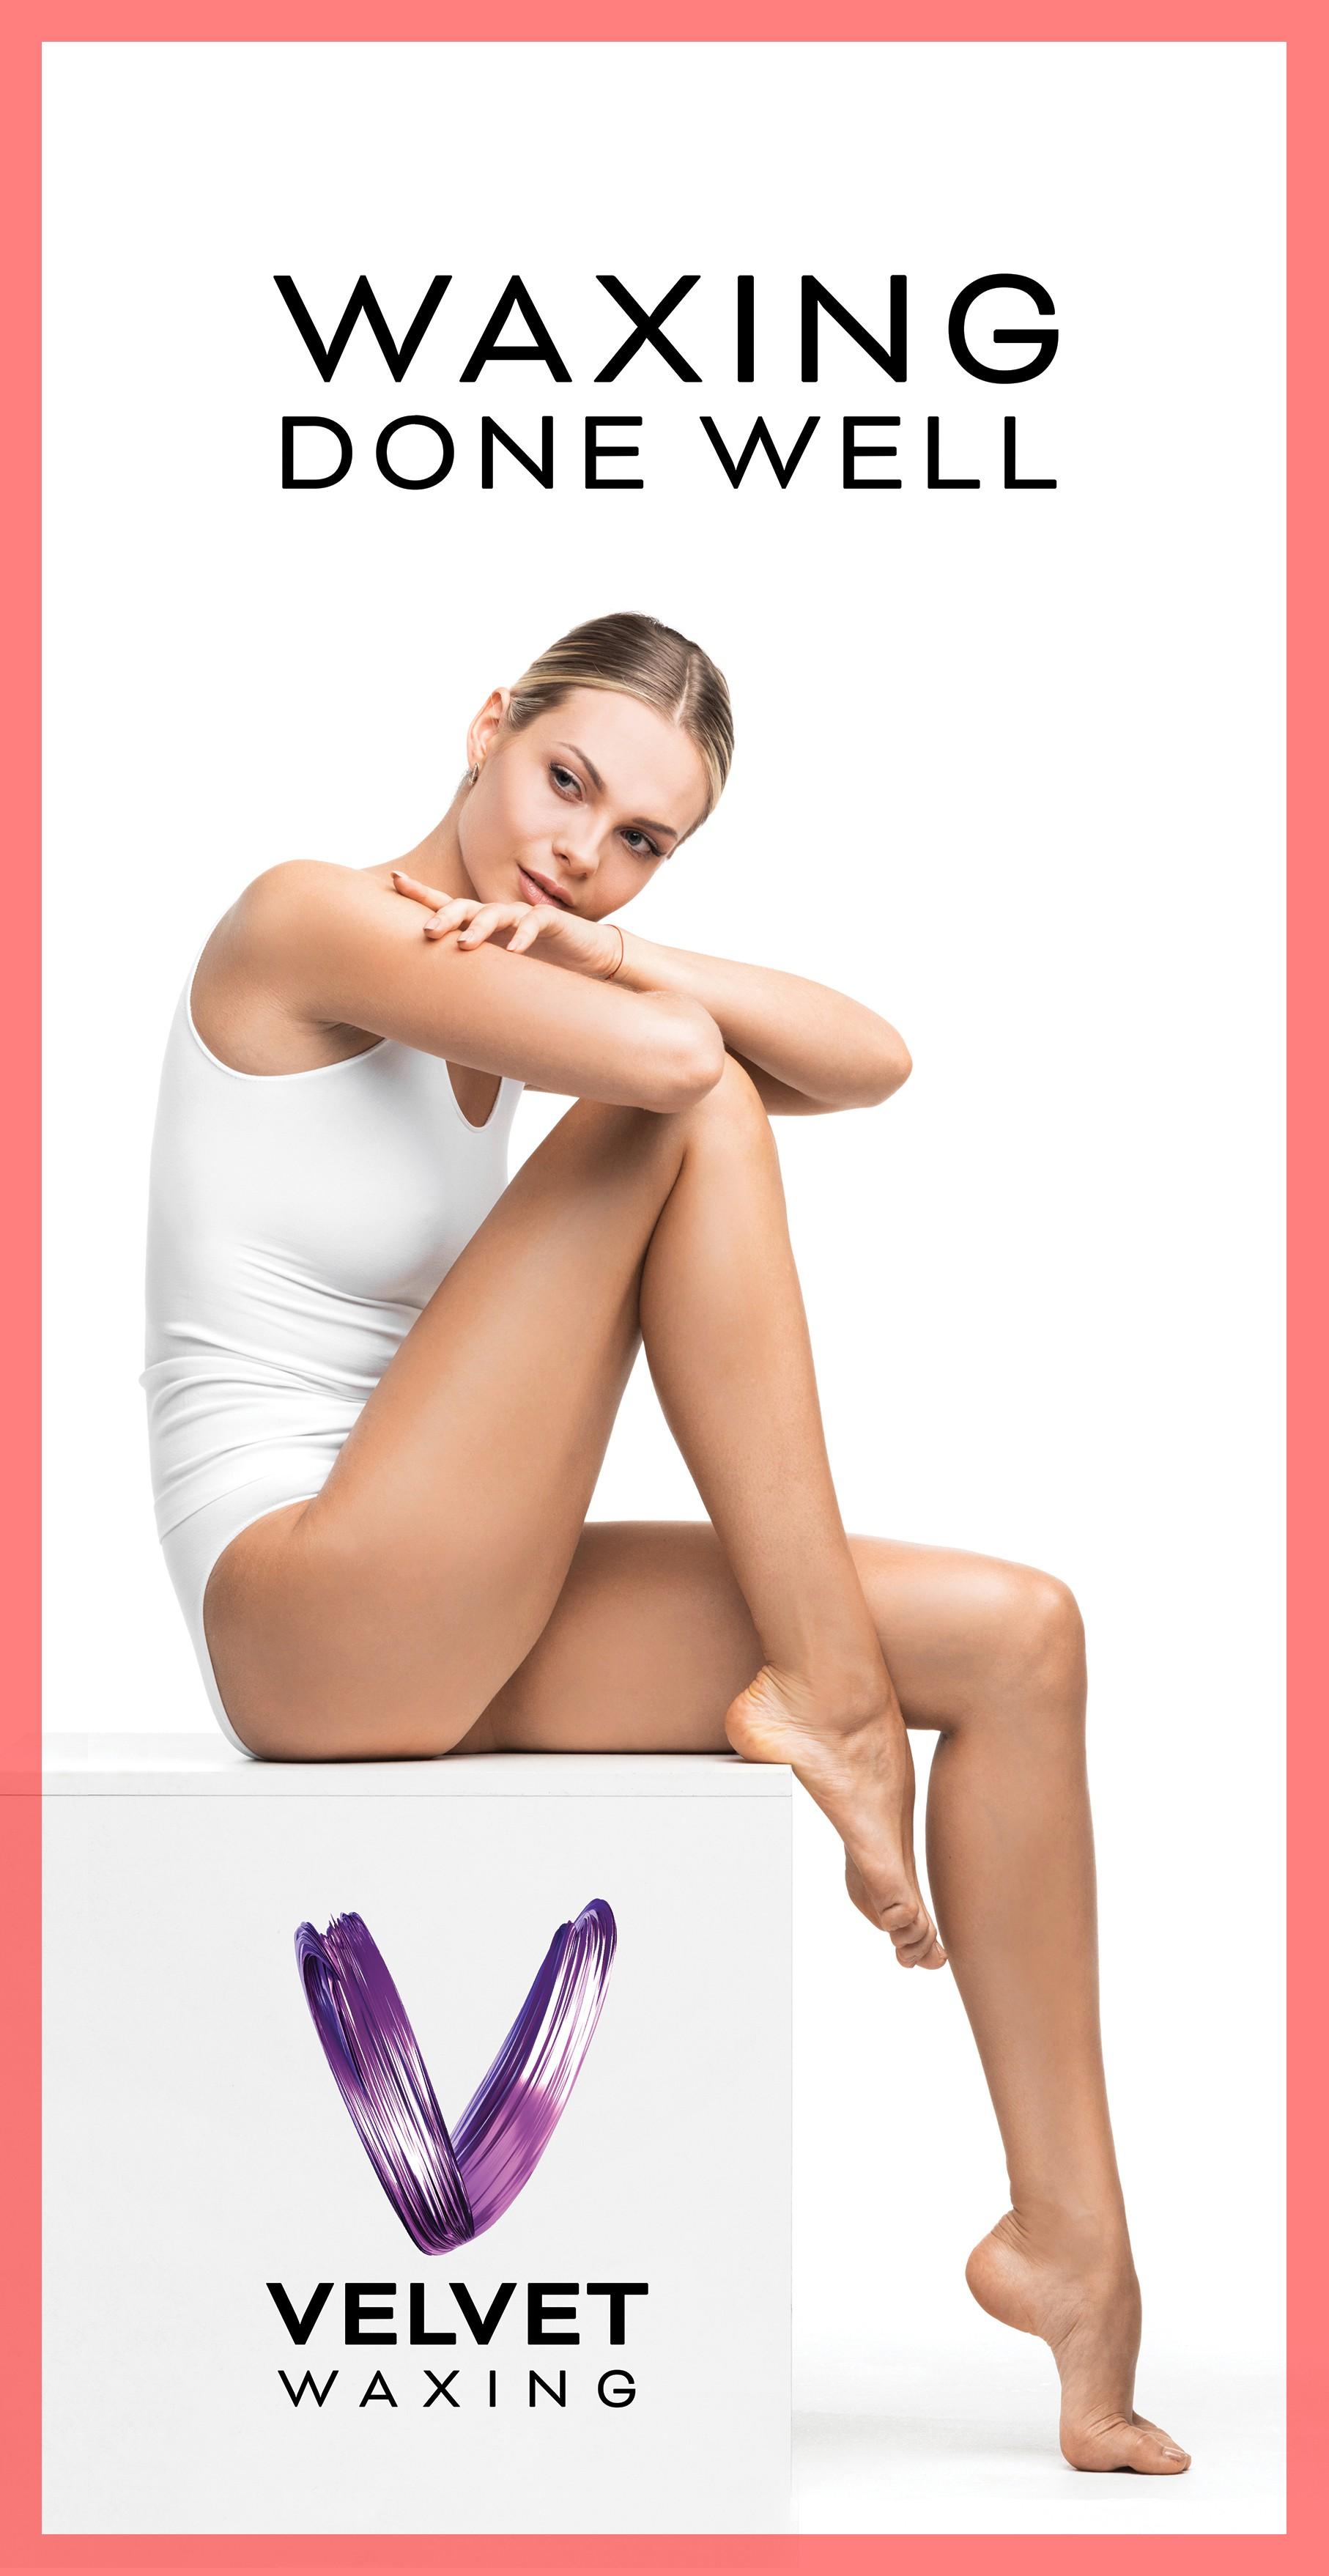 Design girly/minimalistic waxing salon signs for salon Velvet